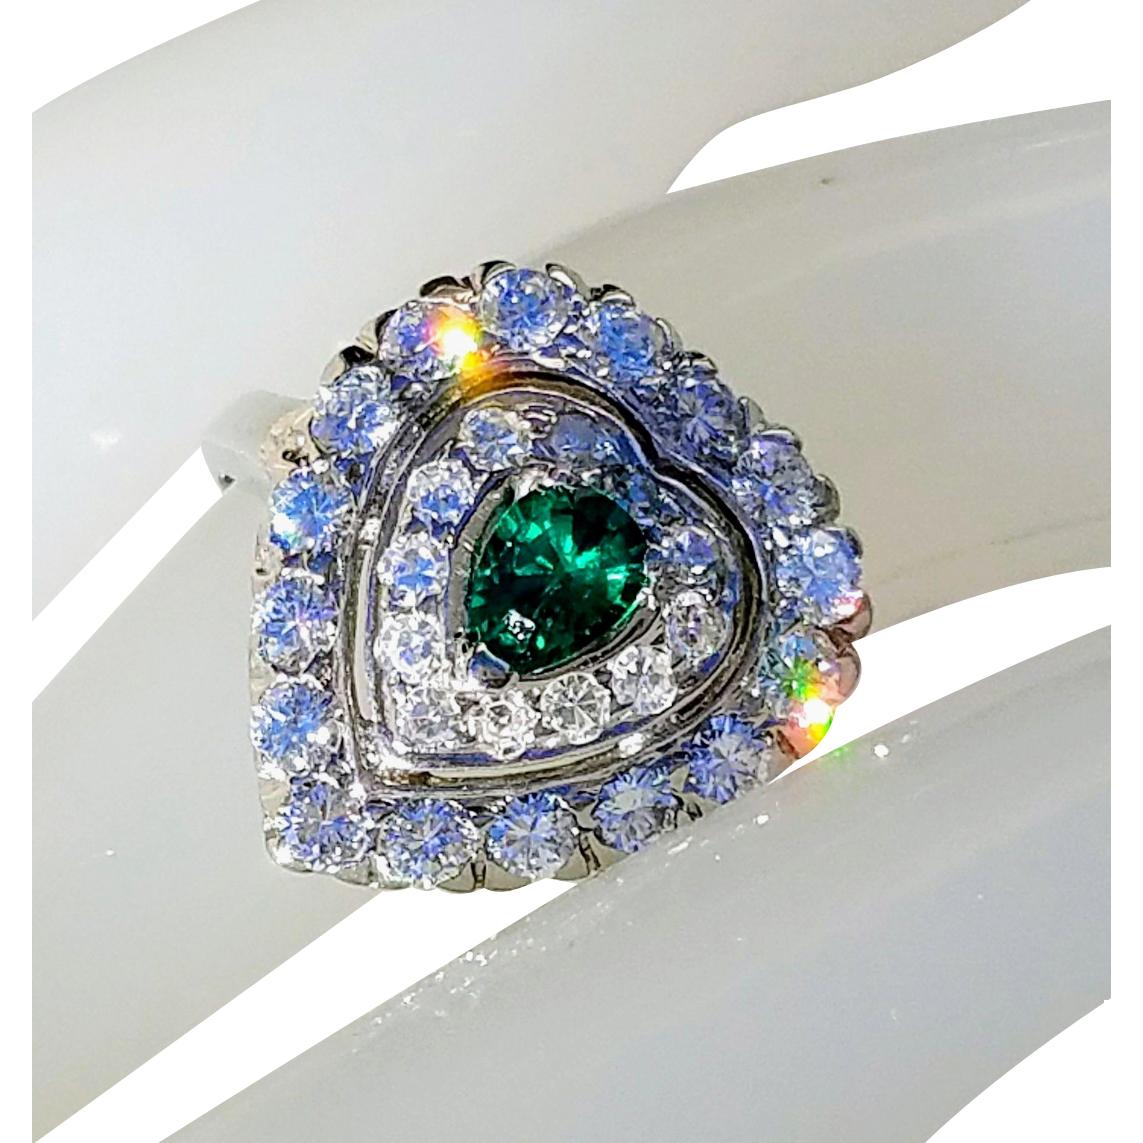 Art Deco 14K Heart-Shaped Emerald & VS Diamond Cluster Engagement Anniversary Ring 7